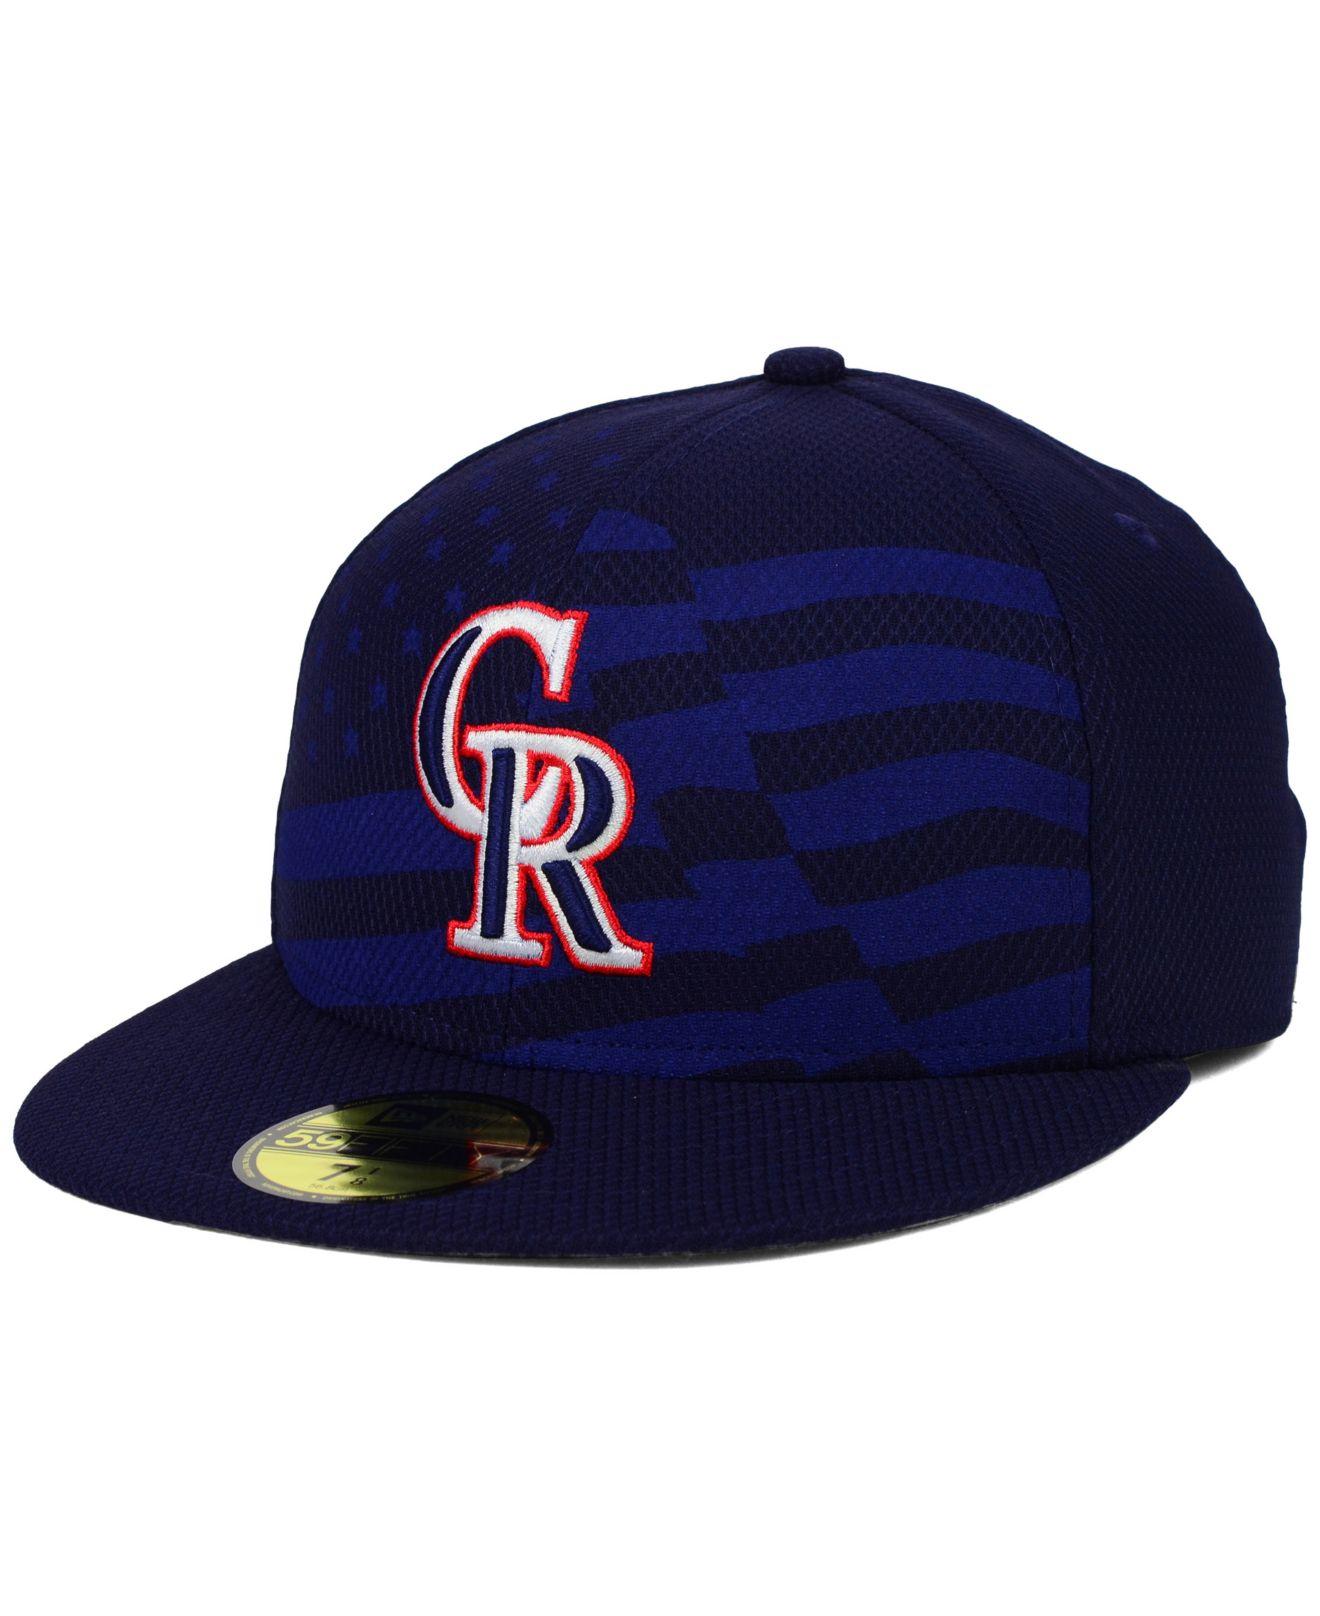 cheap for discount 689f2 02009 ... good lyst ktz colorado rockies july 4th stars stripes 59fifty cap in  99de0 c4bda